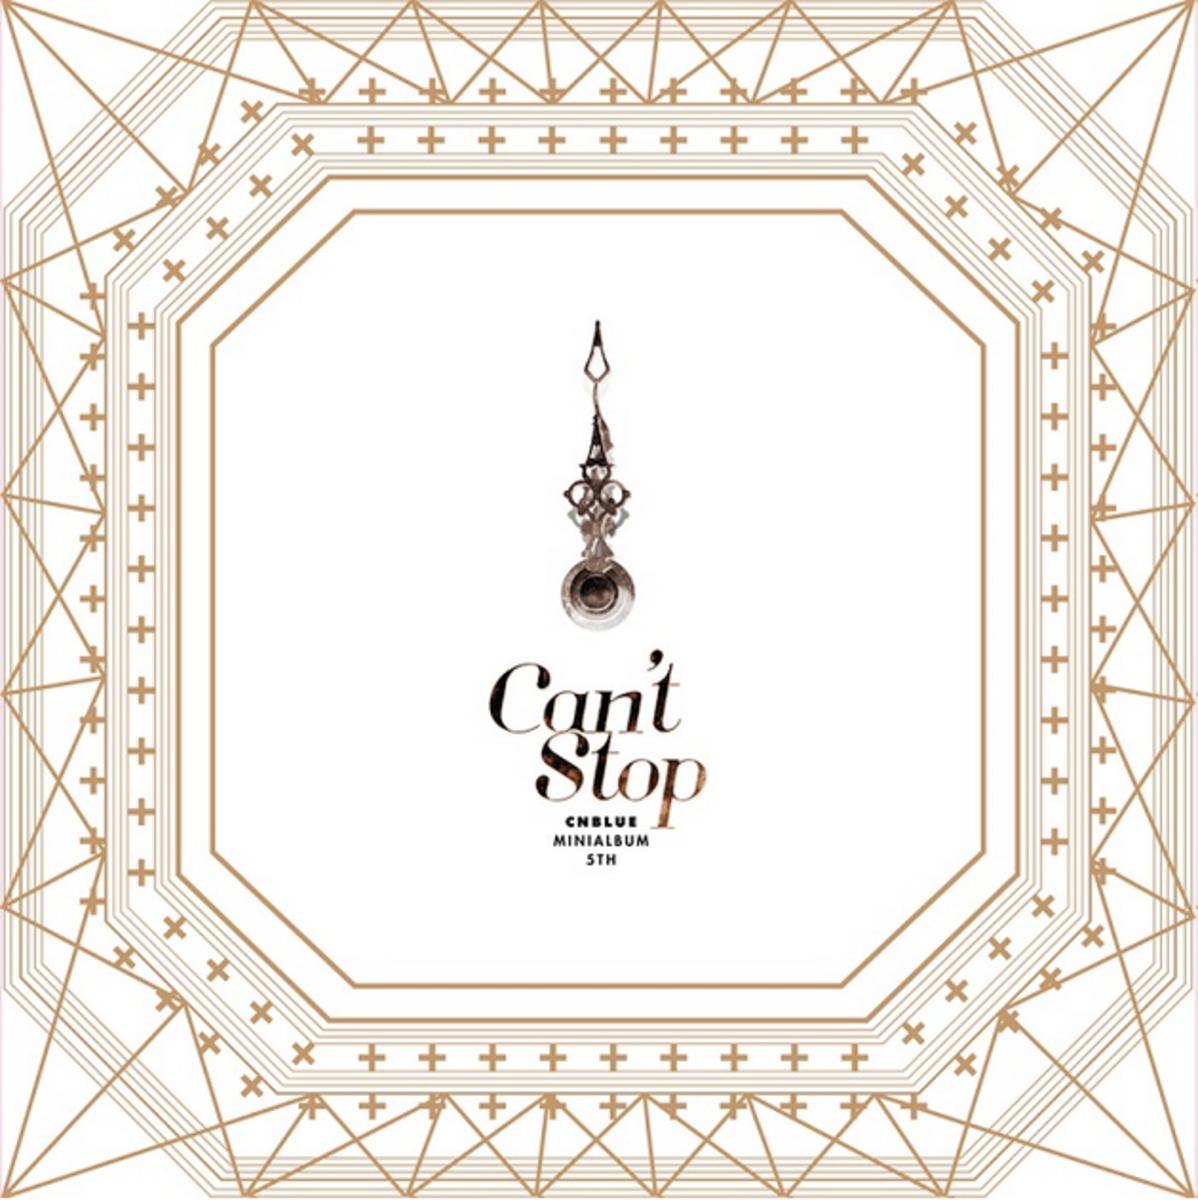 CNBLUE - Mini Album Vol. 5 [Can't Stop Special] _48722